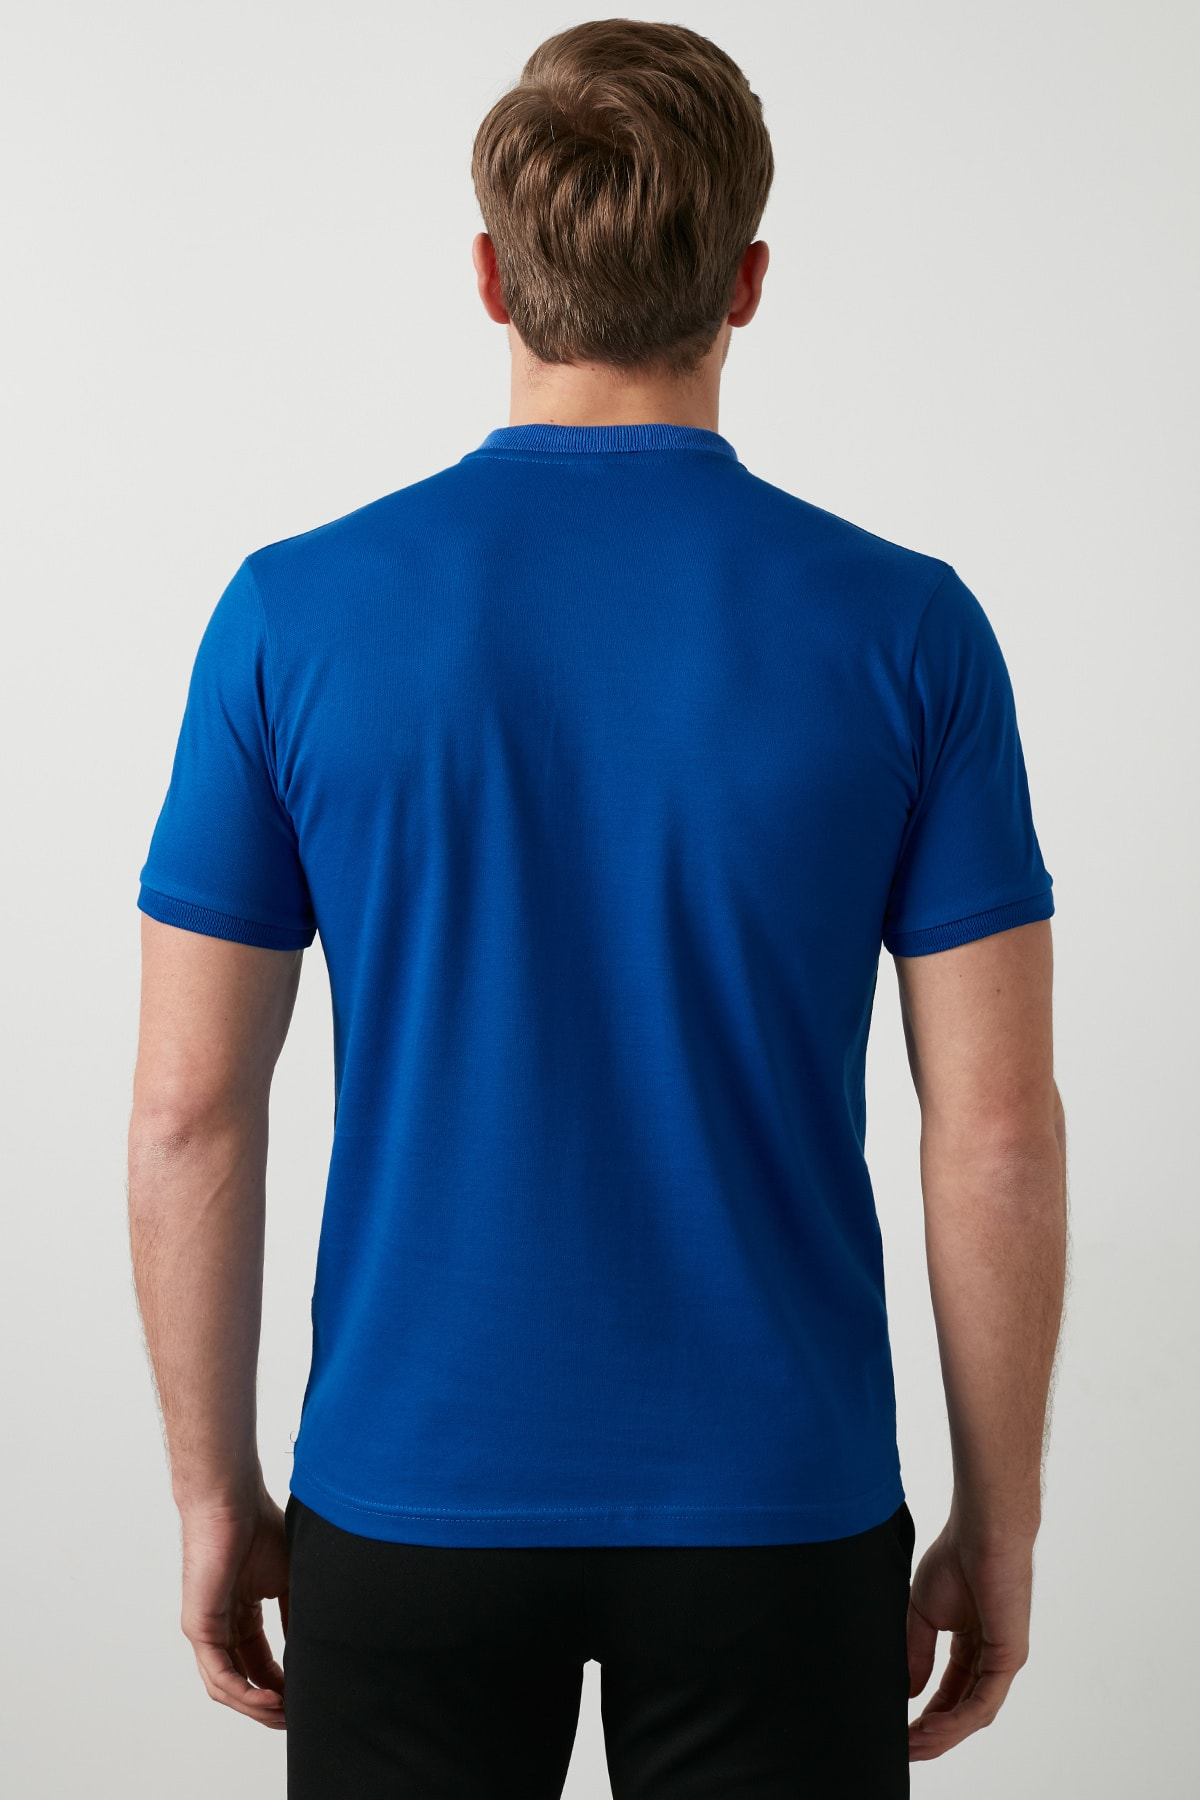 Buratti Erkek Parlıament Mavisi Düğmeli Polo Yaka Standart Fit Pamuklu T Shirt 0438101 3